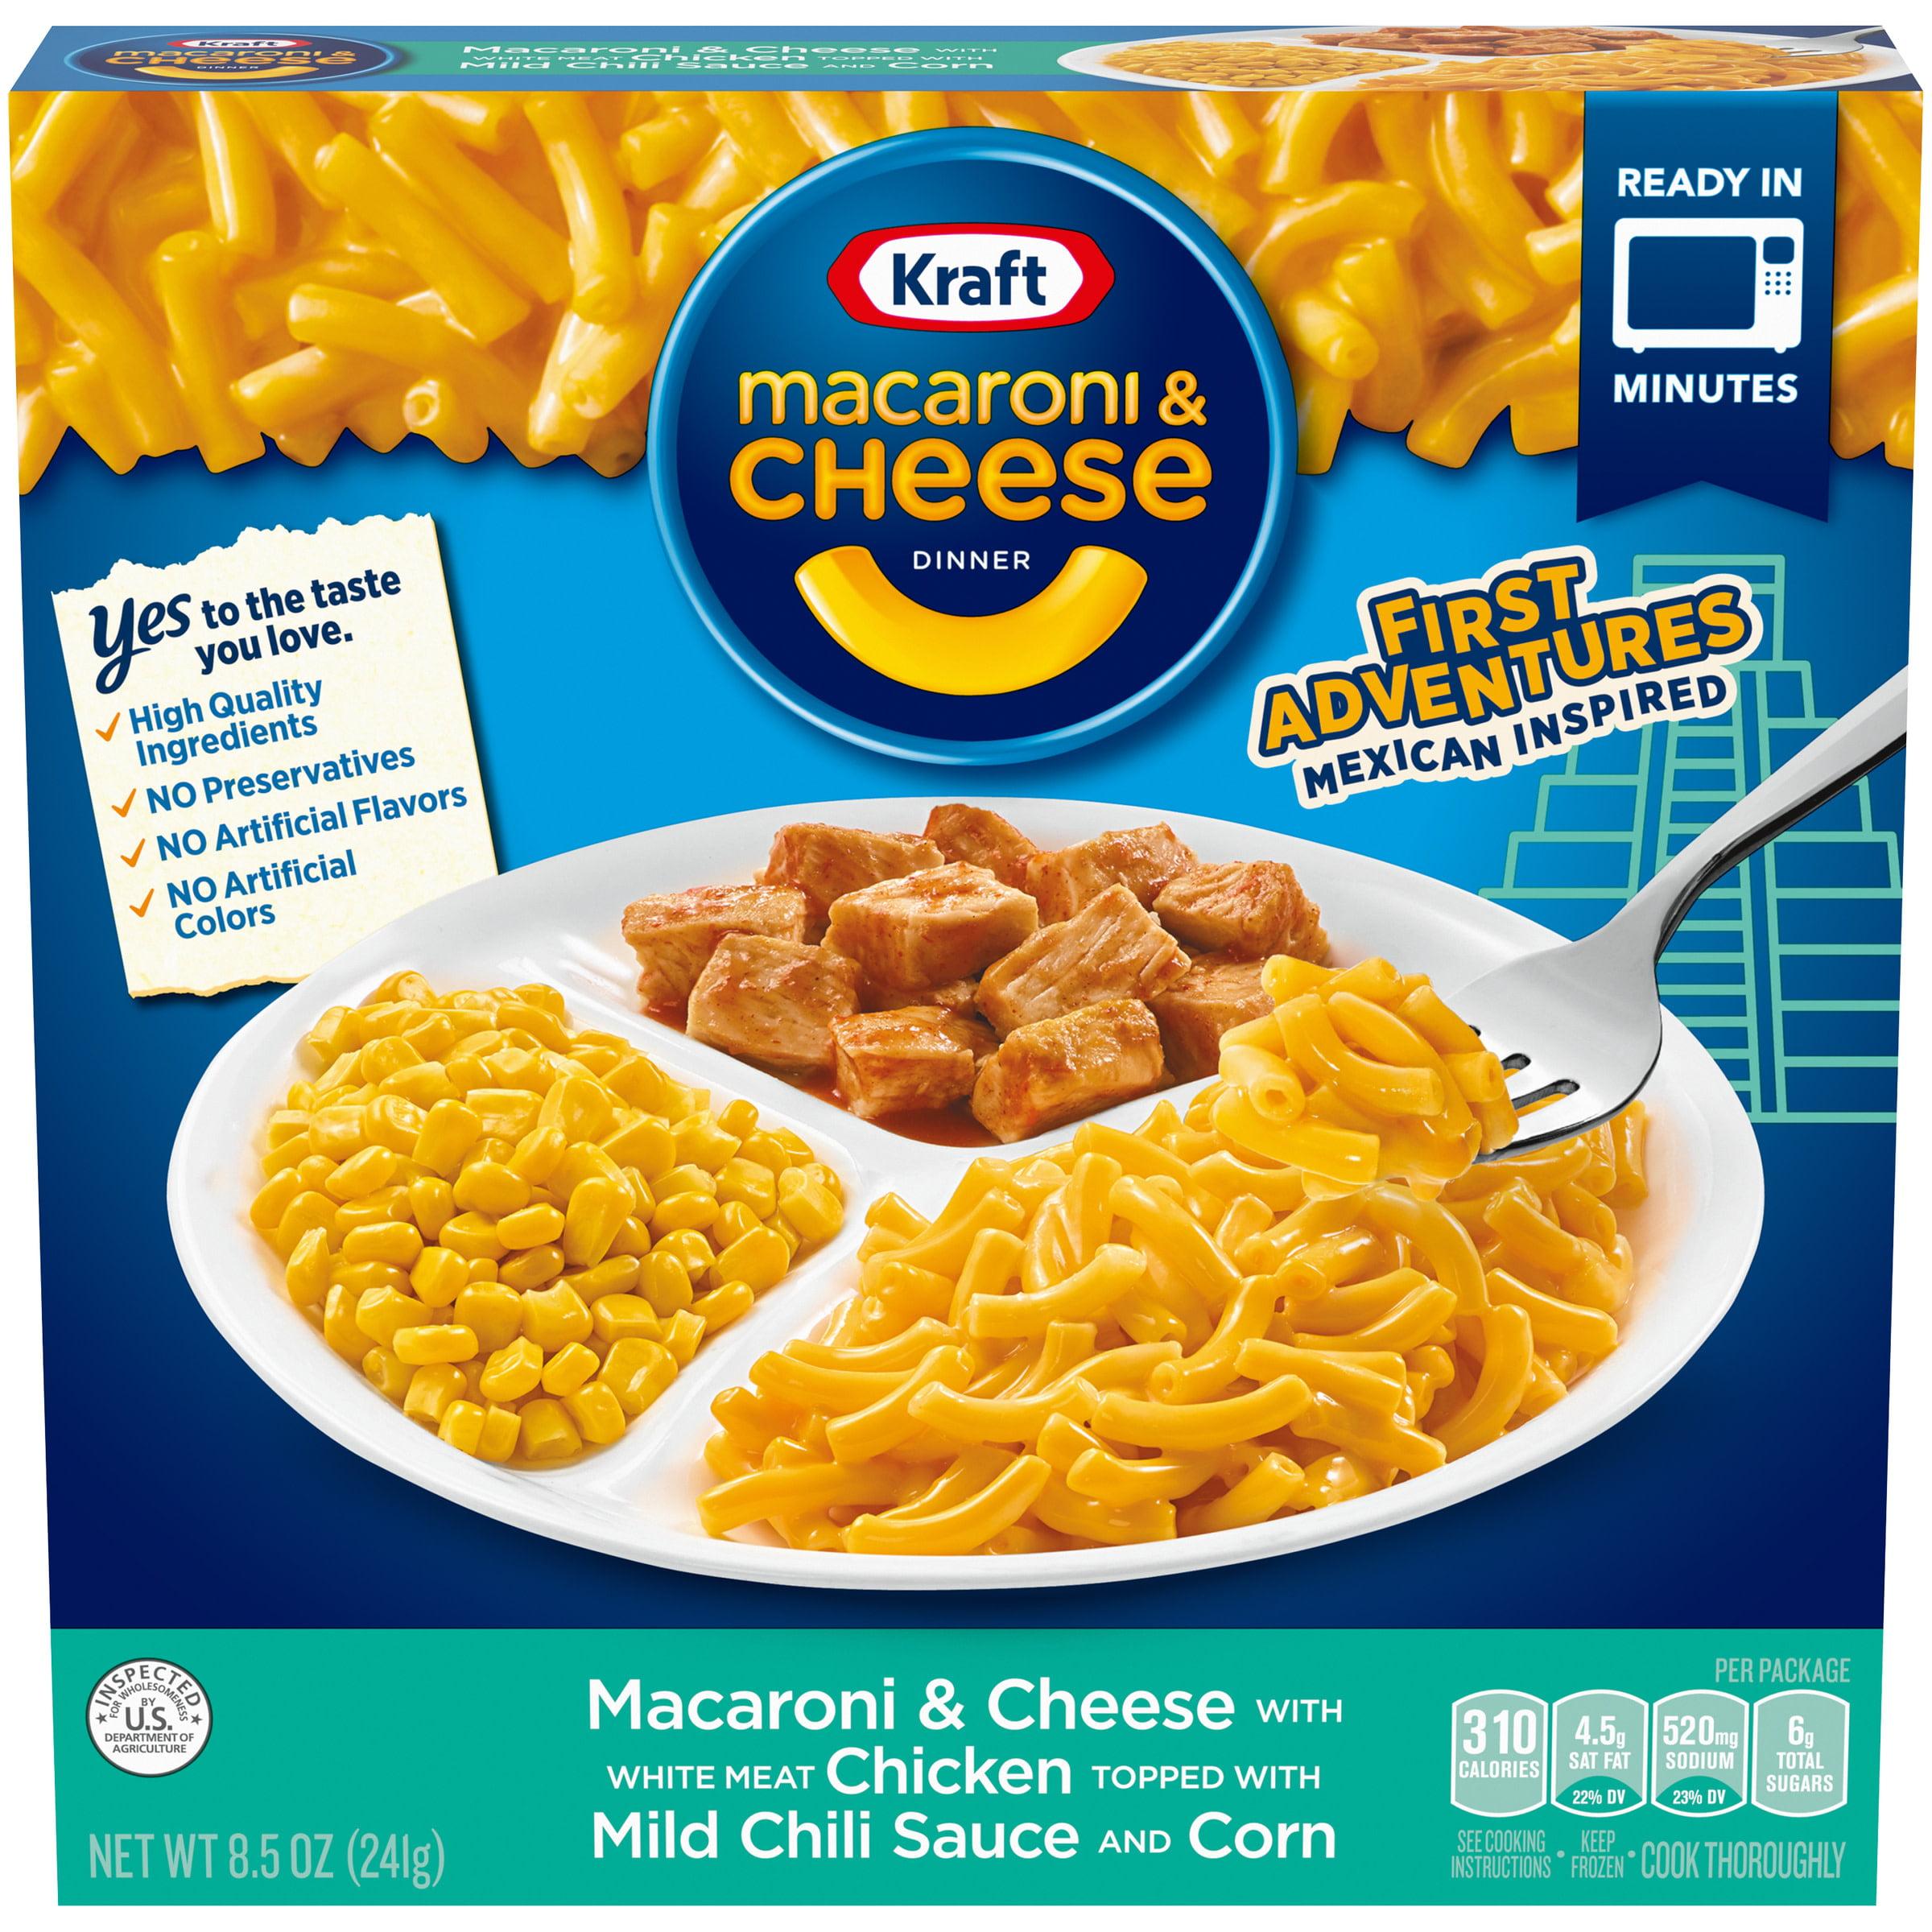 Kraft First Adventures Mexican Inspired Macaroni Cheese Frozen Dinner With Fajita Chicken Mild Chili Sauce Corn 8 5 Oz Box Walmart Com Walmart Com